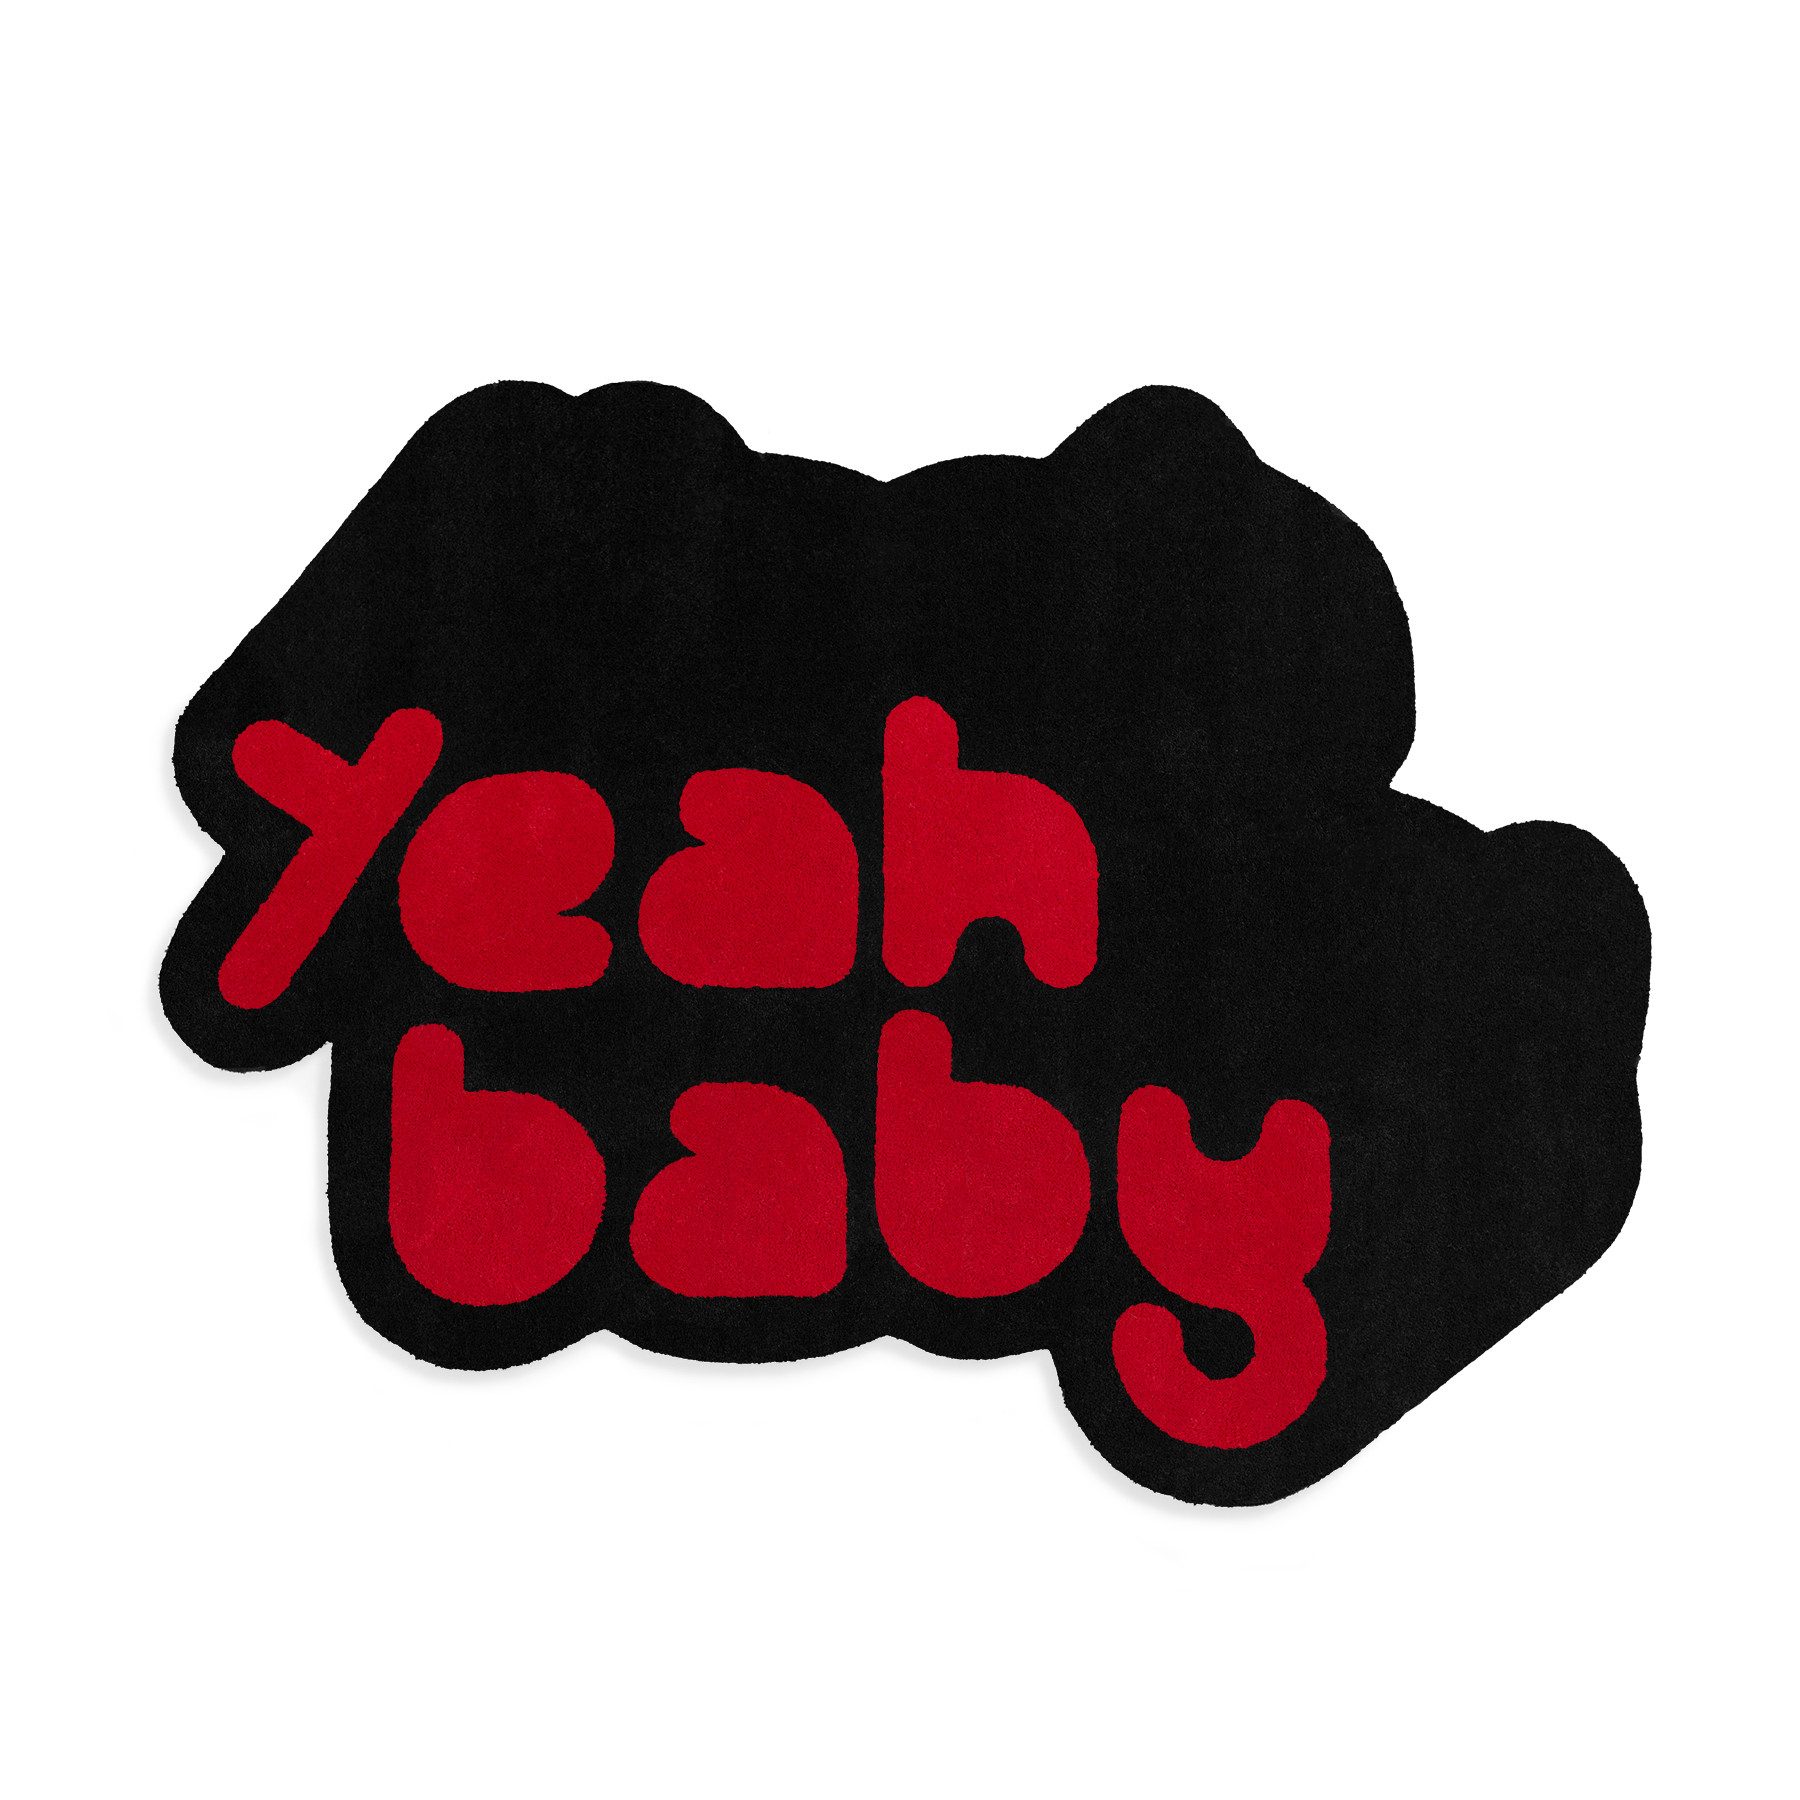 Tapete em Nylon Antron 2 Cores Yeah Baby